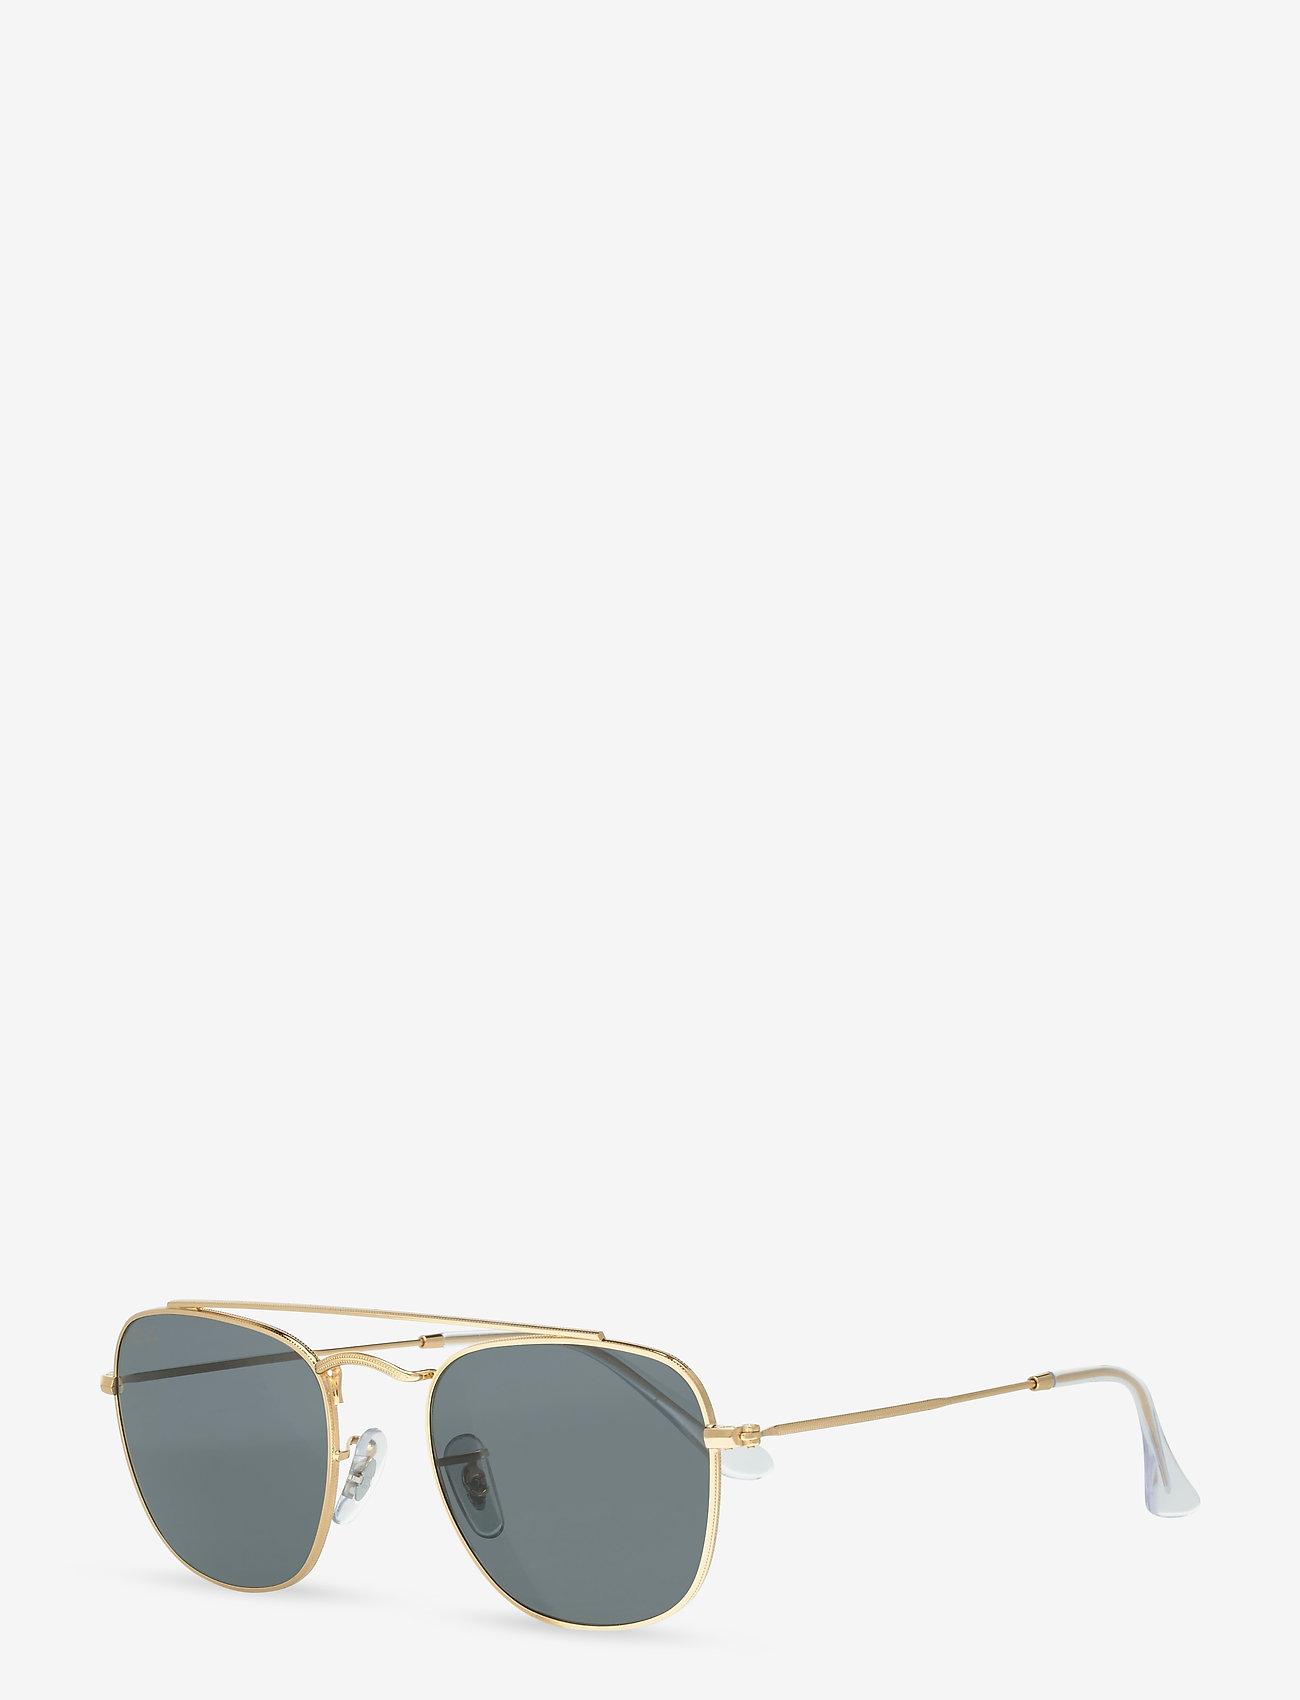 Ray-Ban - Sunglasses - d-shaped - blue - 1